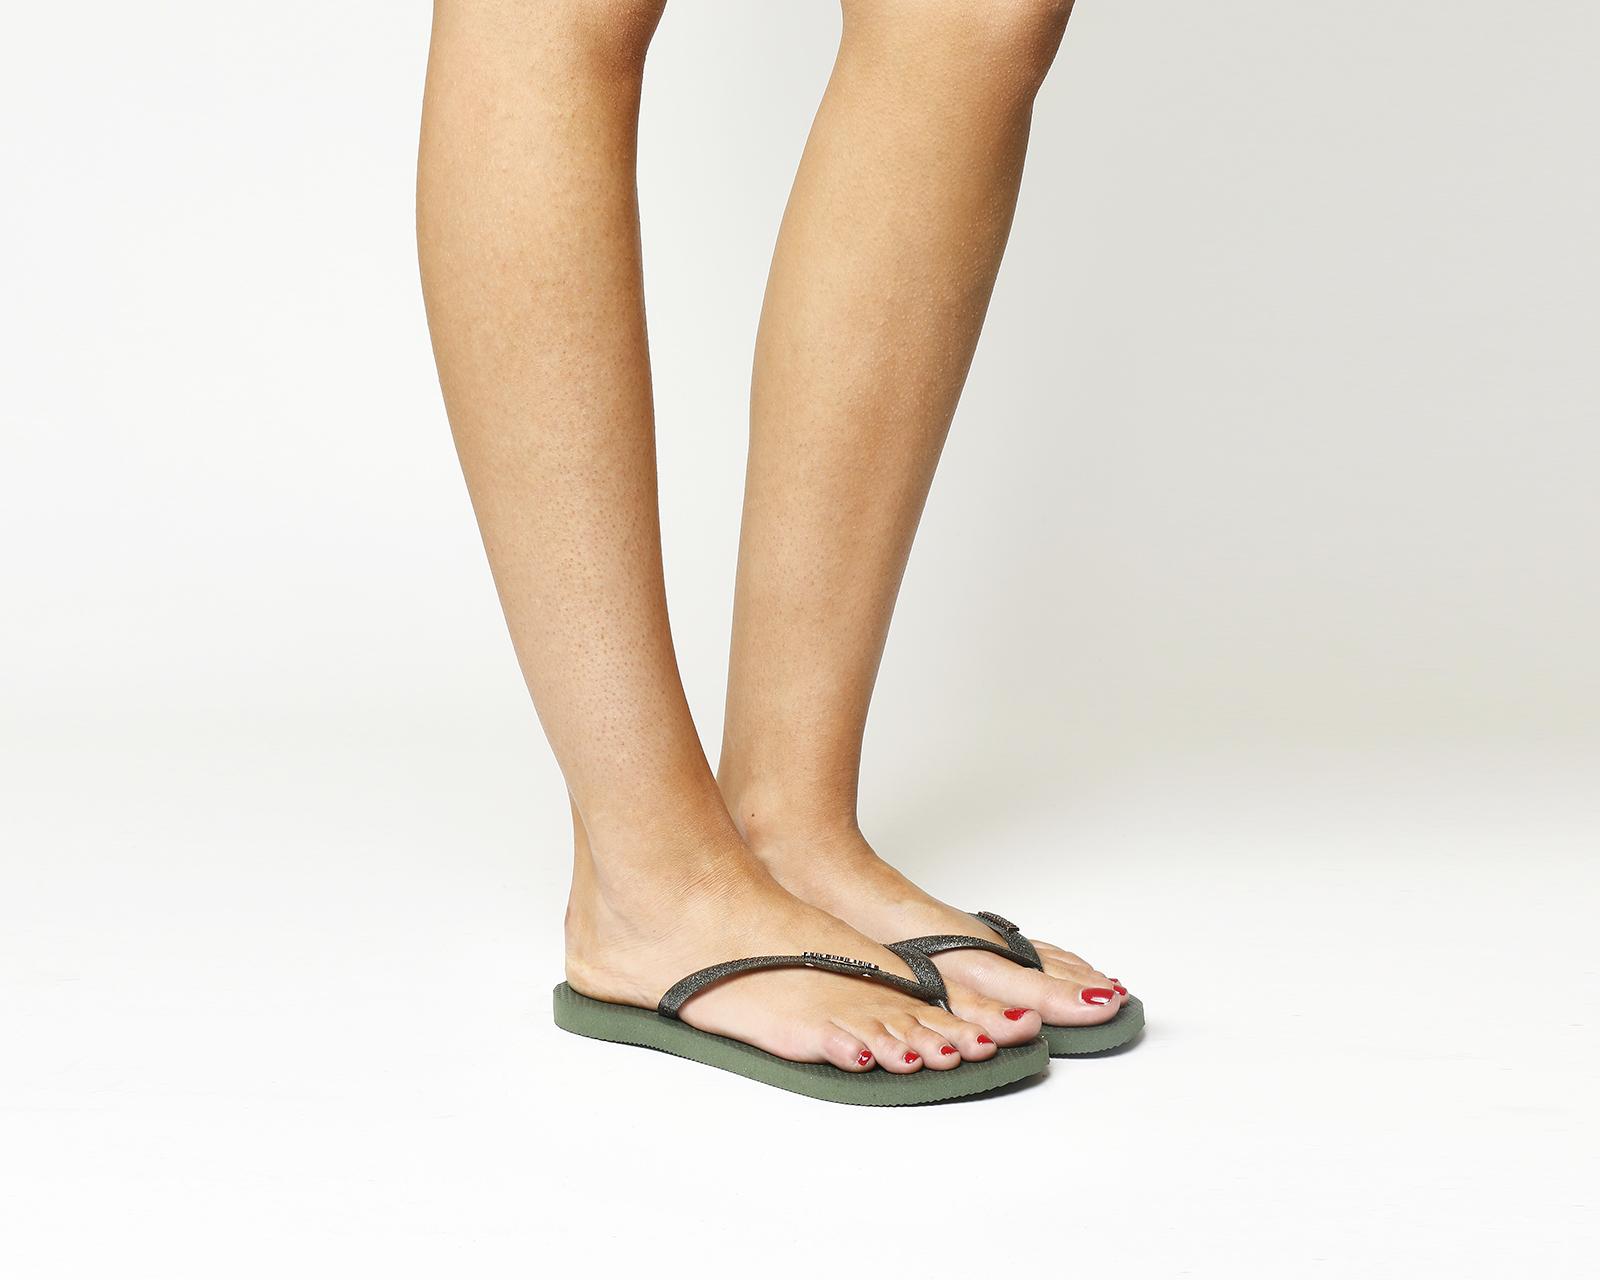 4517f65072aec Sentinel Womens Havaianas Slim Logo Metallic Flip Flops GREEN OLIVE Sandals